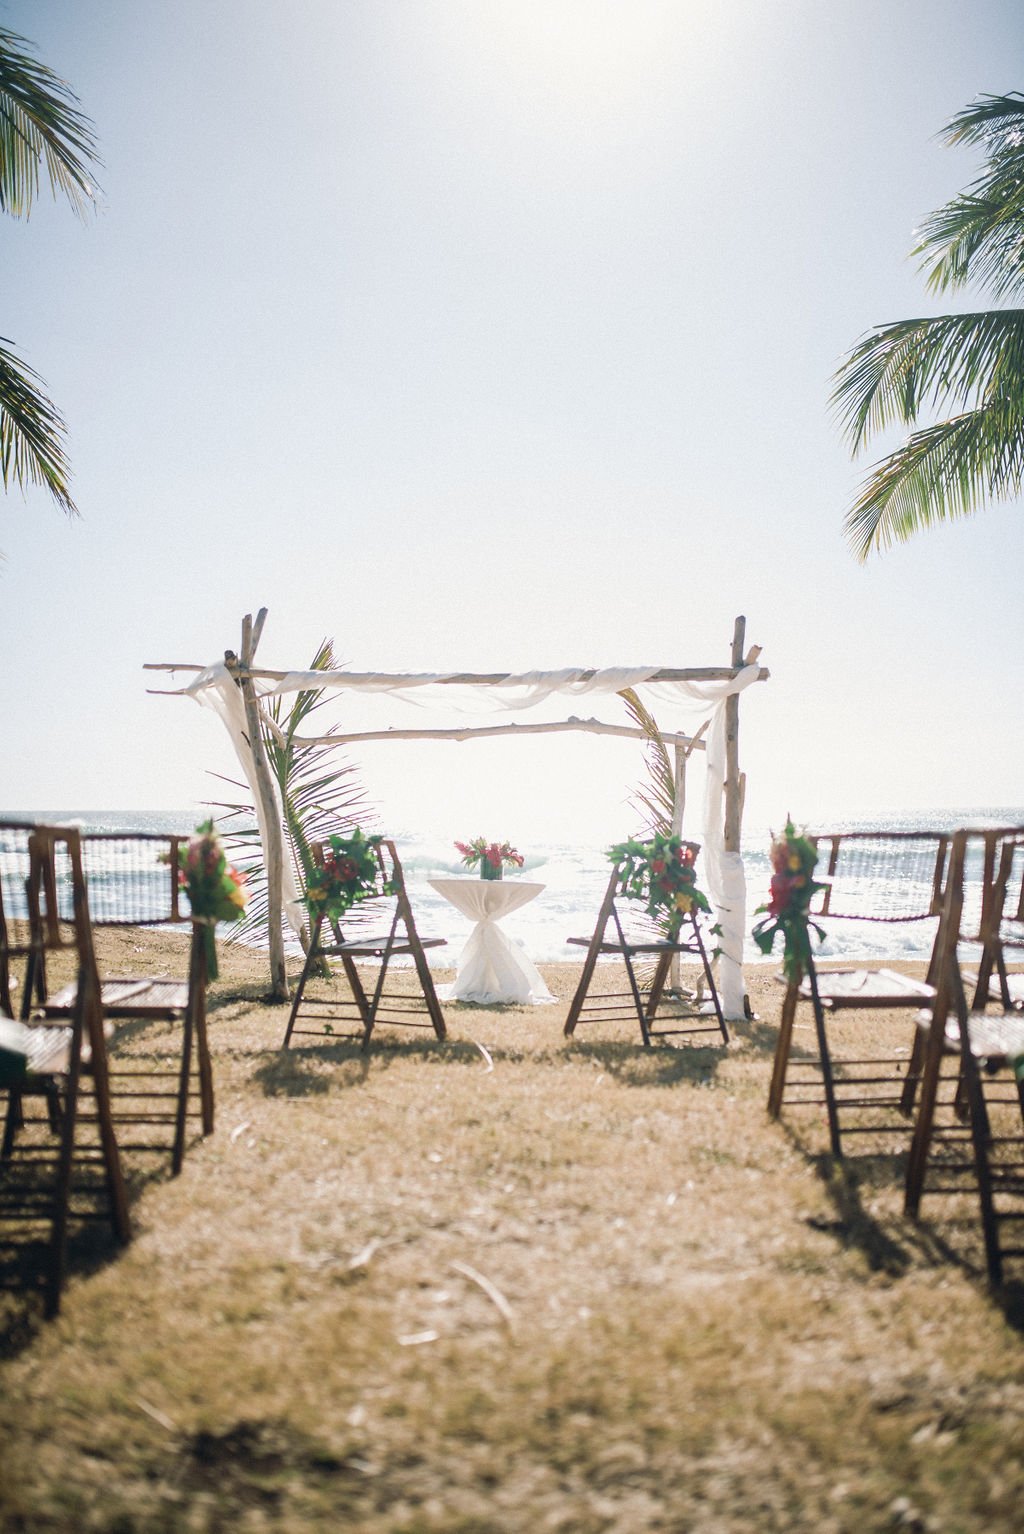 Costa Rica Wedding Services (7)